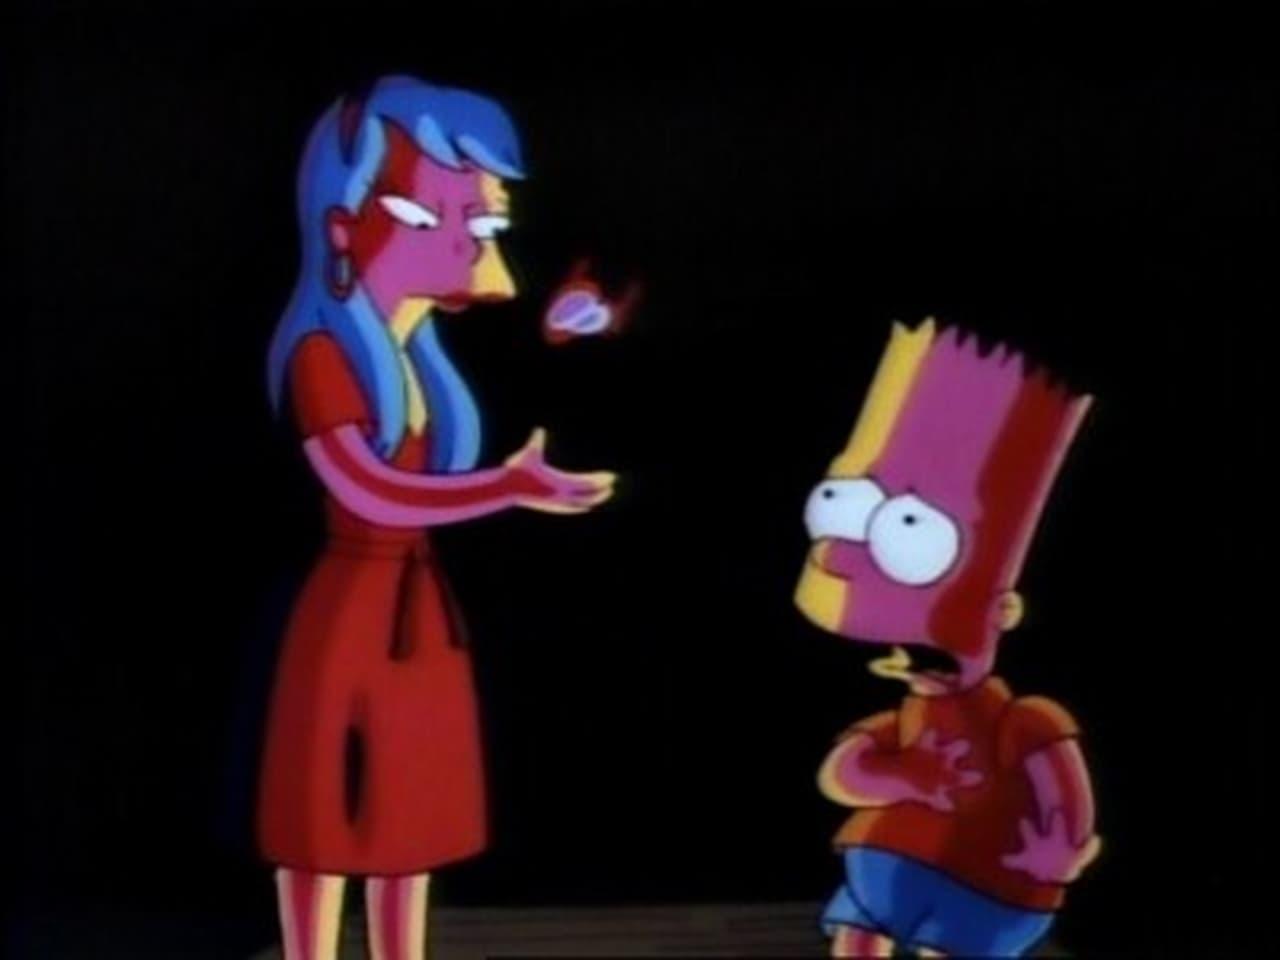 The Simpsons - Season 4 Episode 8 : New Kid on the Block